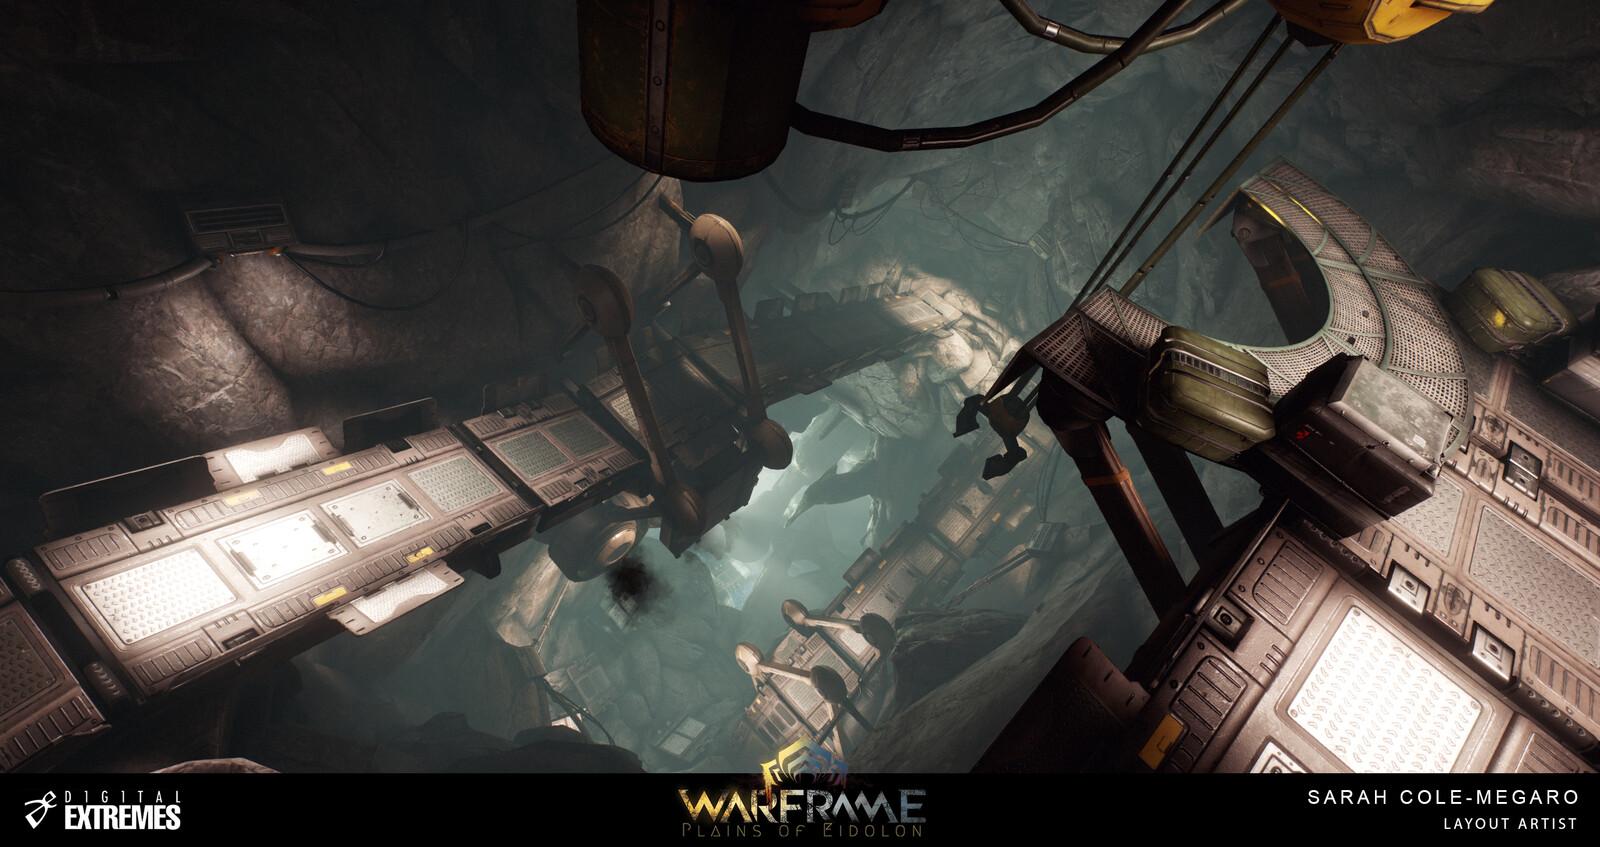 WarFrame: Plains of Eidolon